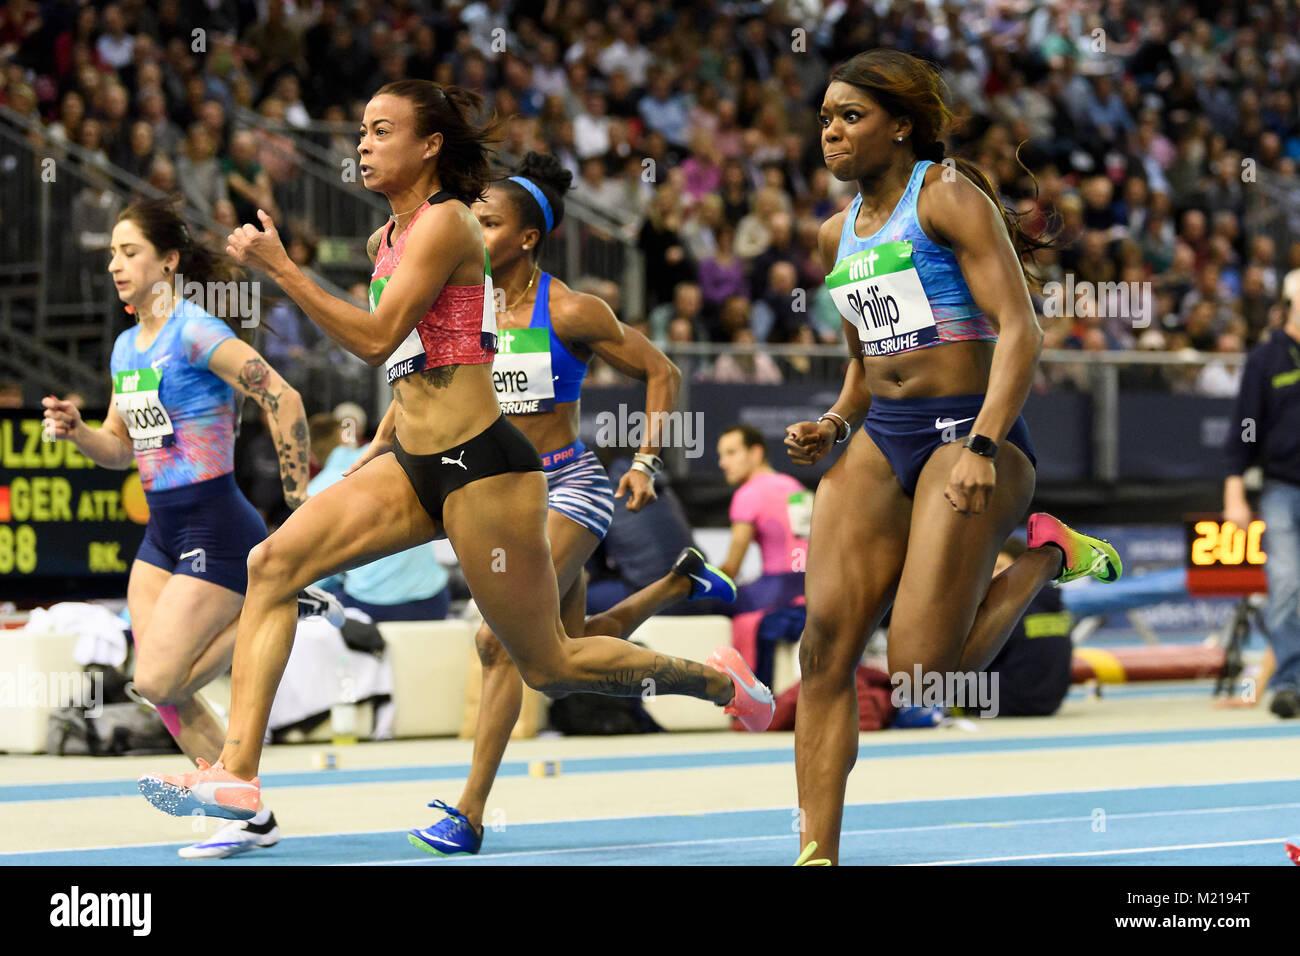 Karlsruhe, Deutschland. 03rd Feb, 2018. 60m Frauen: Siegerin, Gewinnerin Tatjana Pinto (GER), withte, rechts Asha - Stock Image